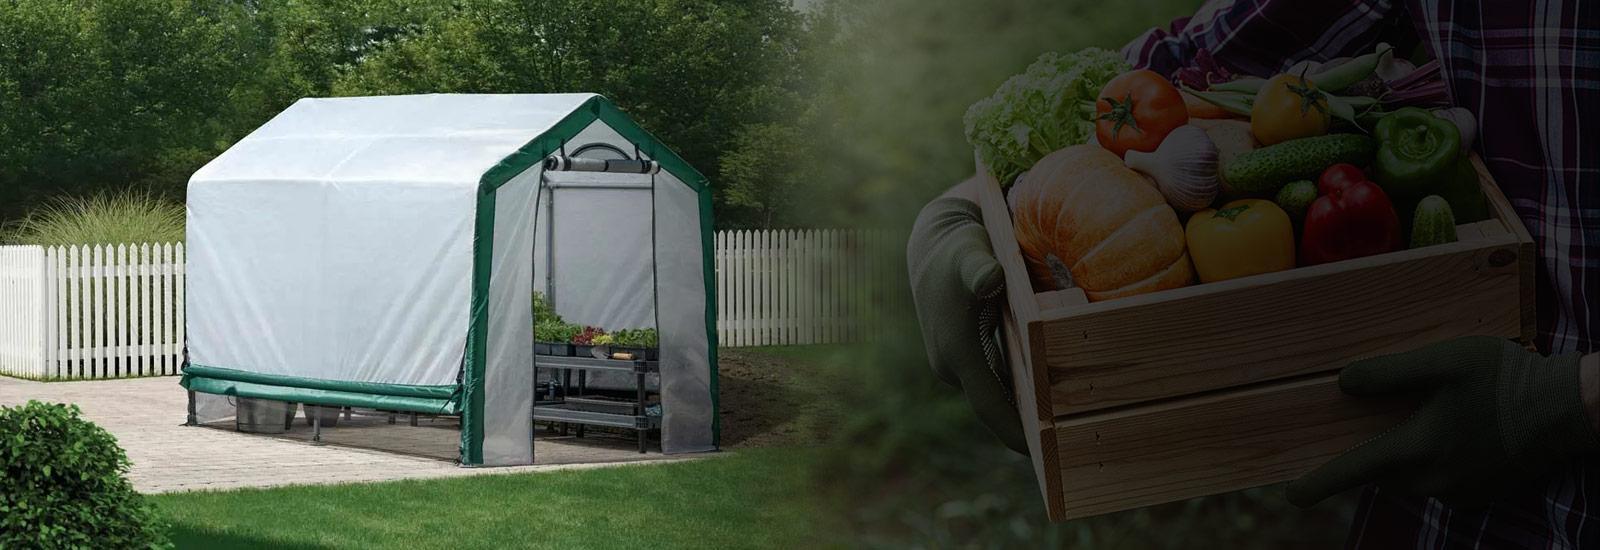 Spring Organic Growers Greenhouse